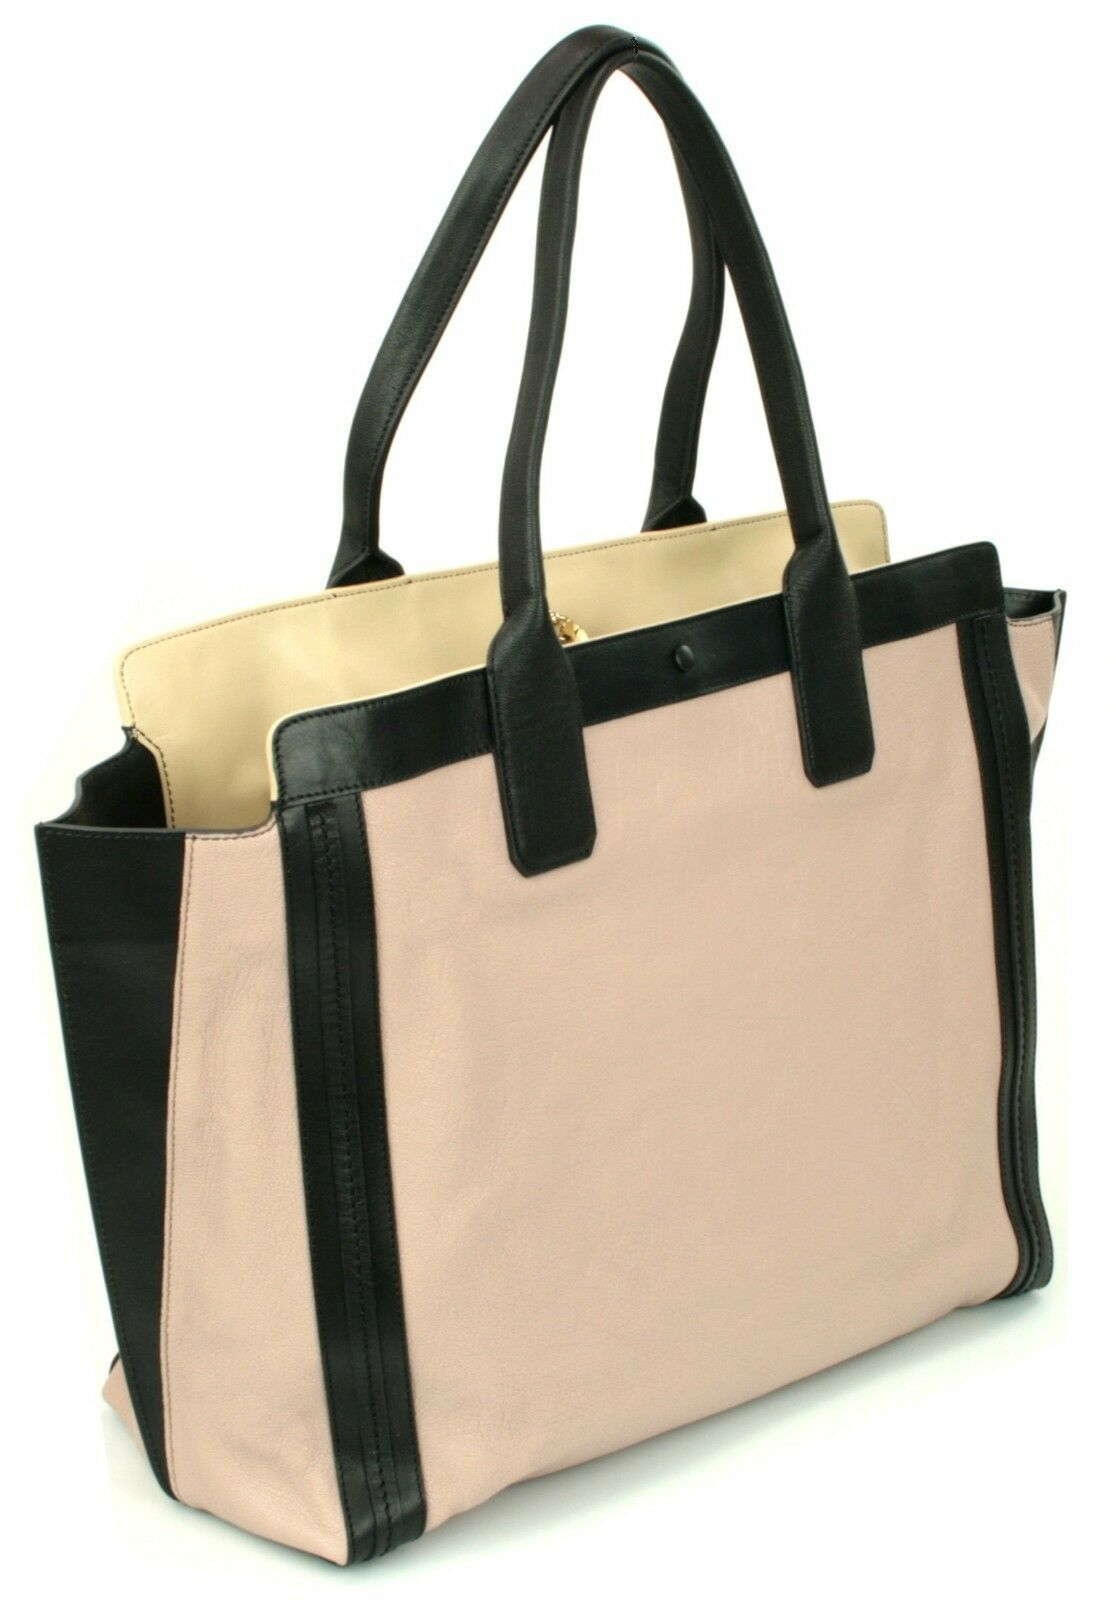 Chloe Alison Tote Bag Leather Tea Petal and Black Medium Handbag RRP £880  image 2